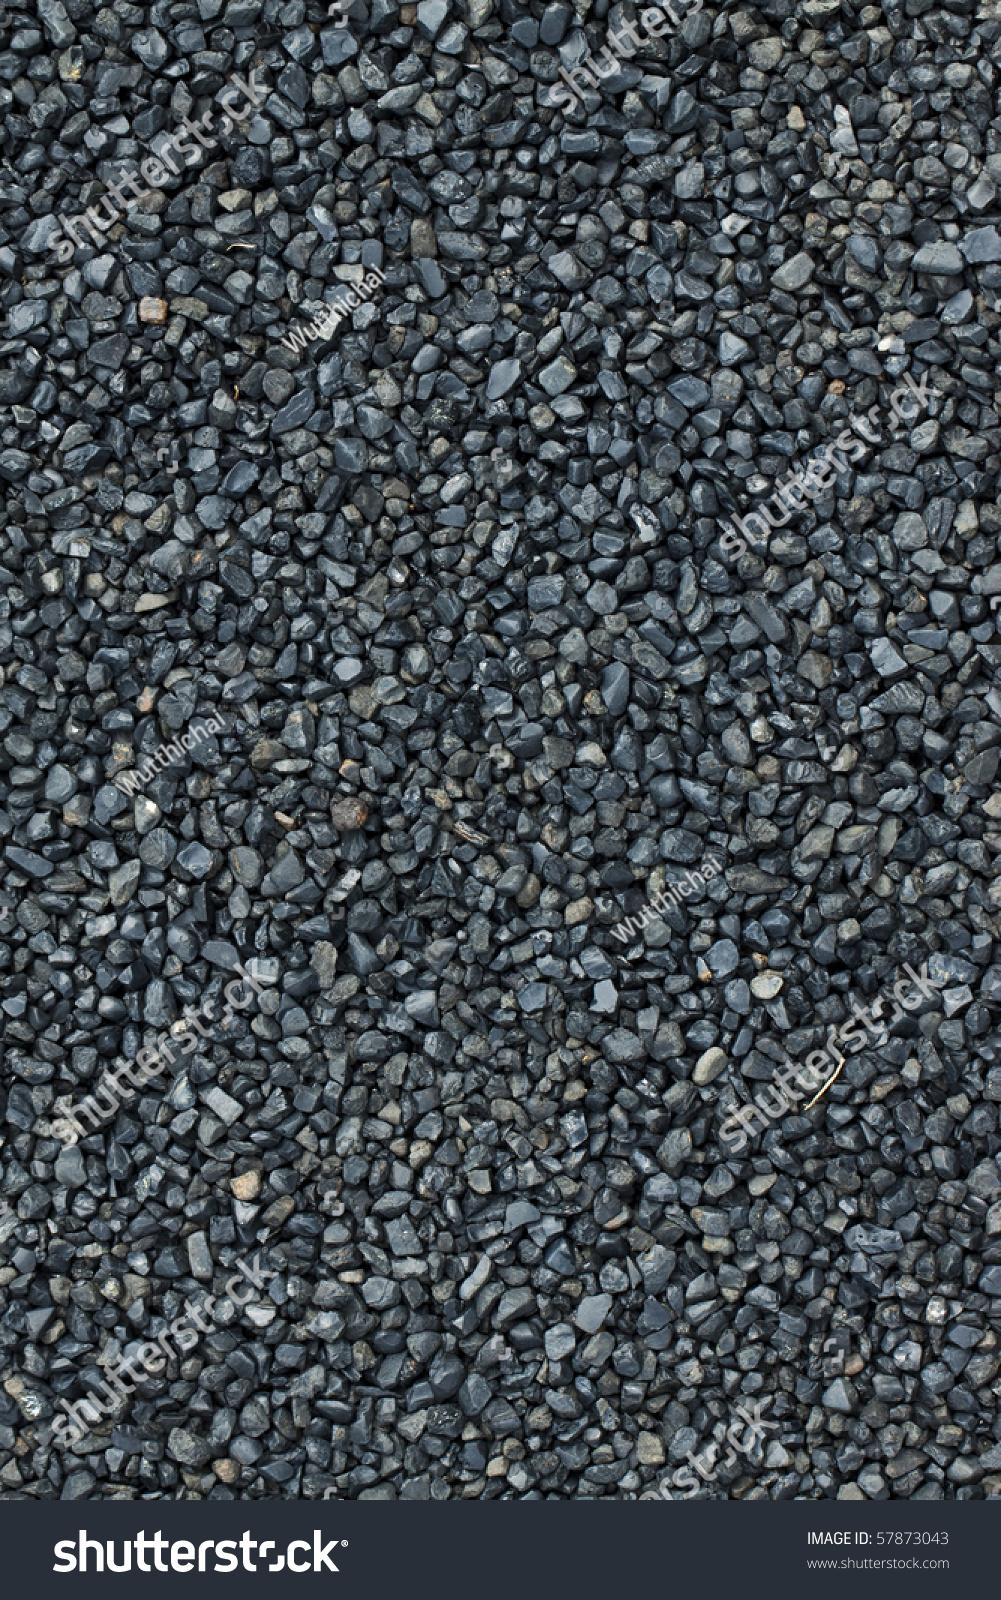 Black Pebble Texture Stock Photo 57873043 - Shutterstock